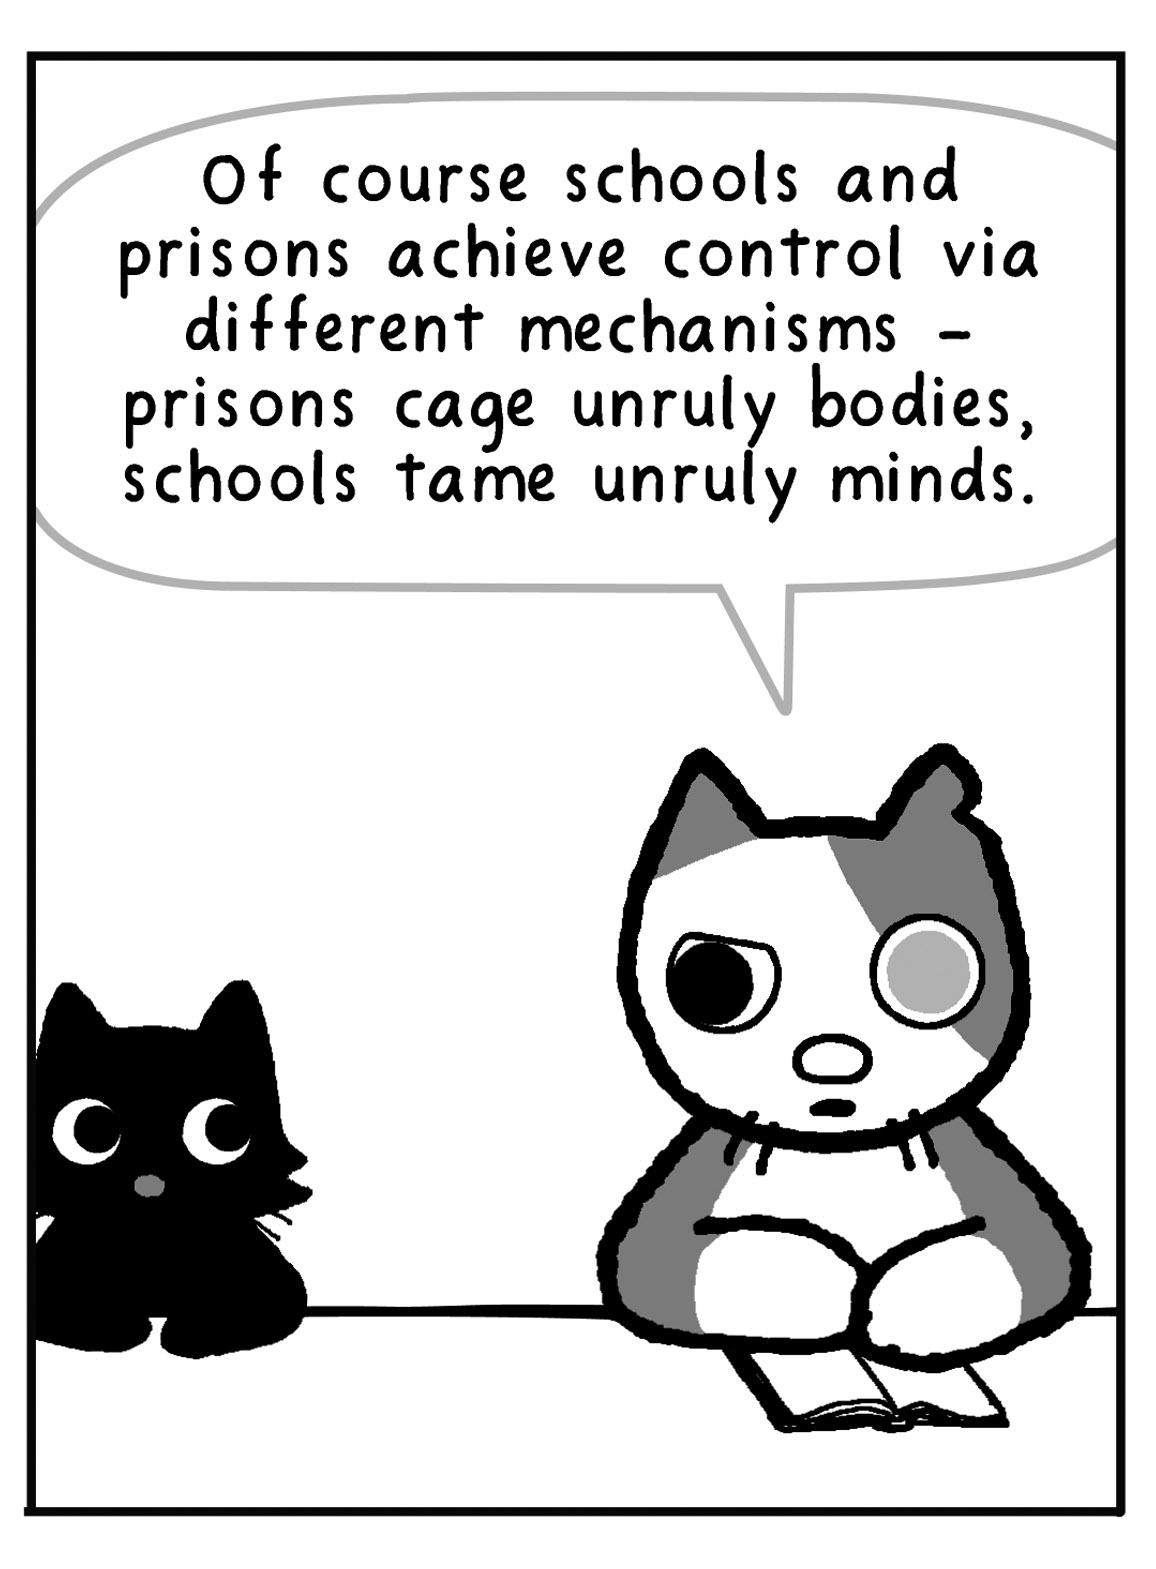 20130607_school and prisons_05-03.jpg